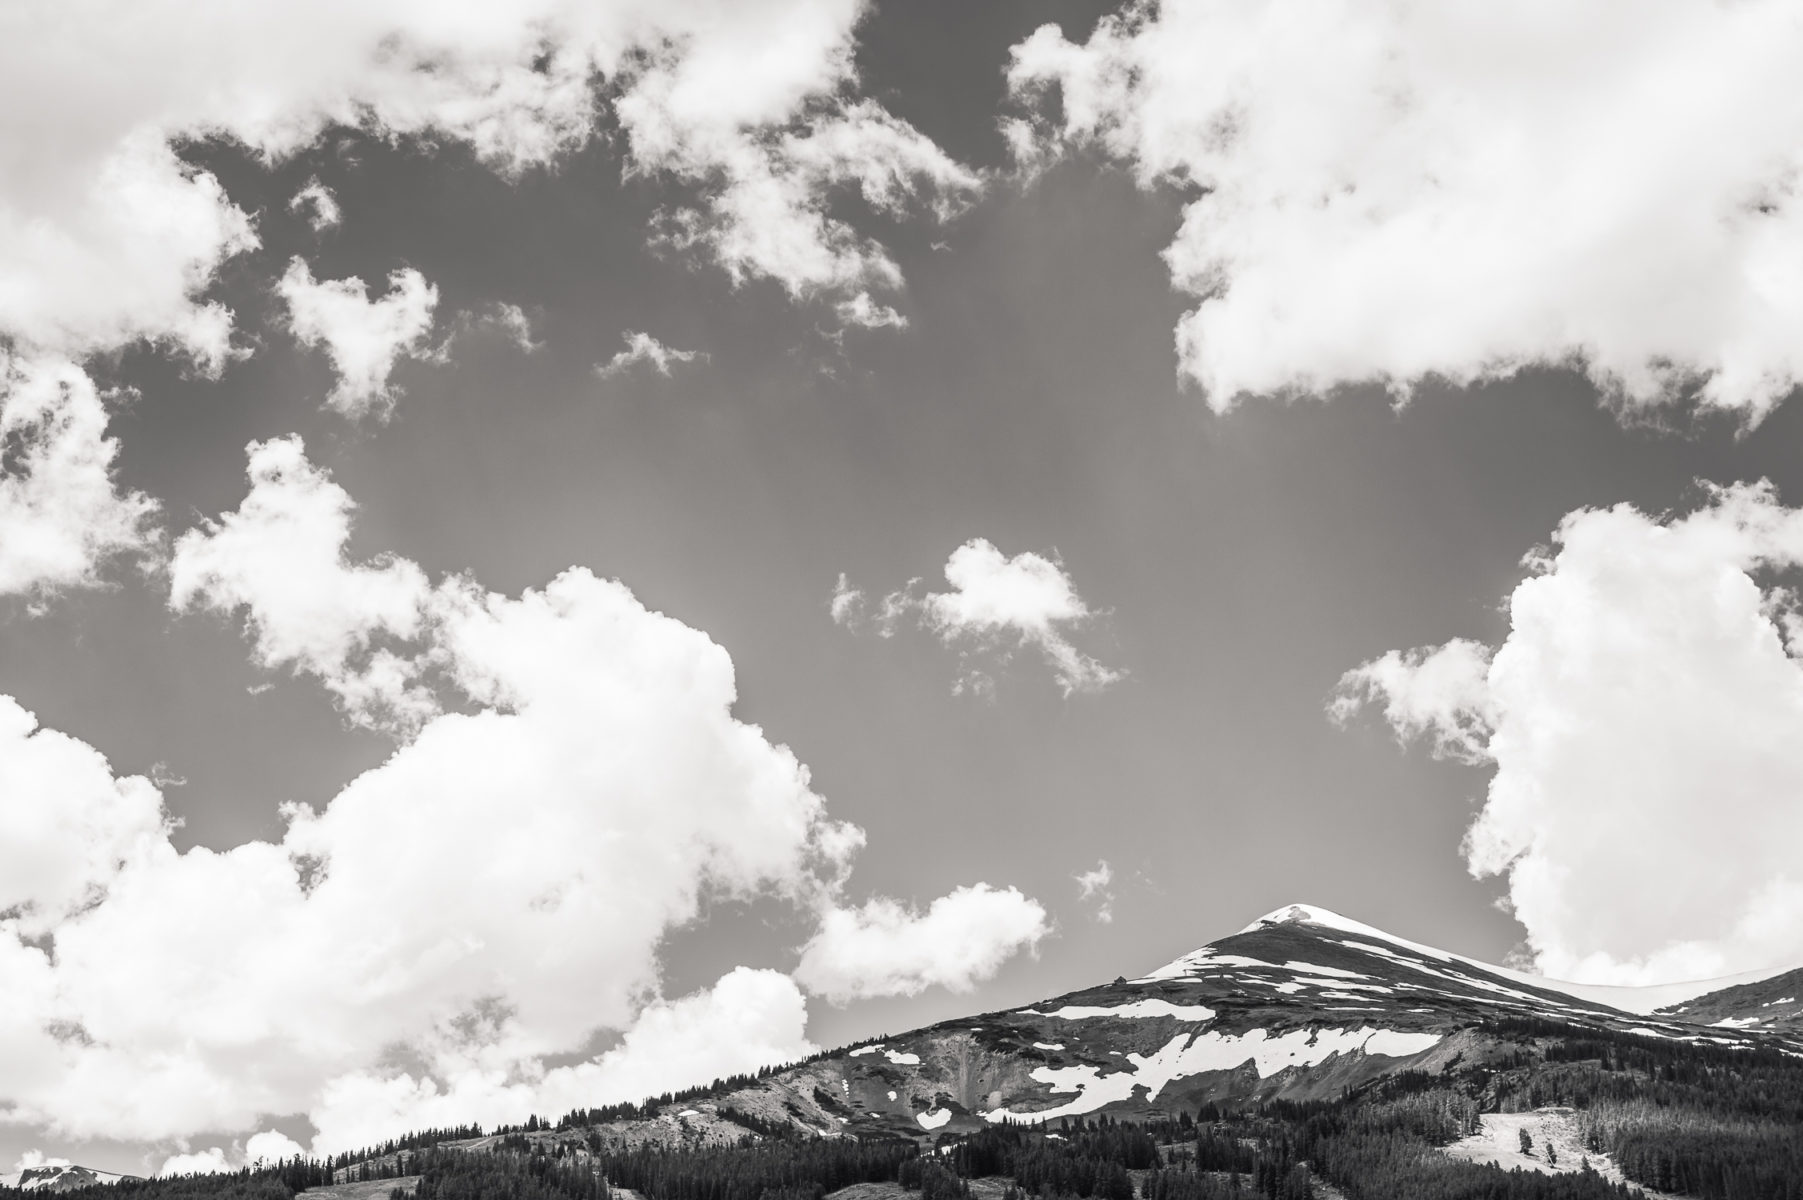 Breckenridge Mountain in Colorado